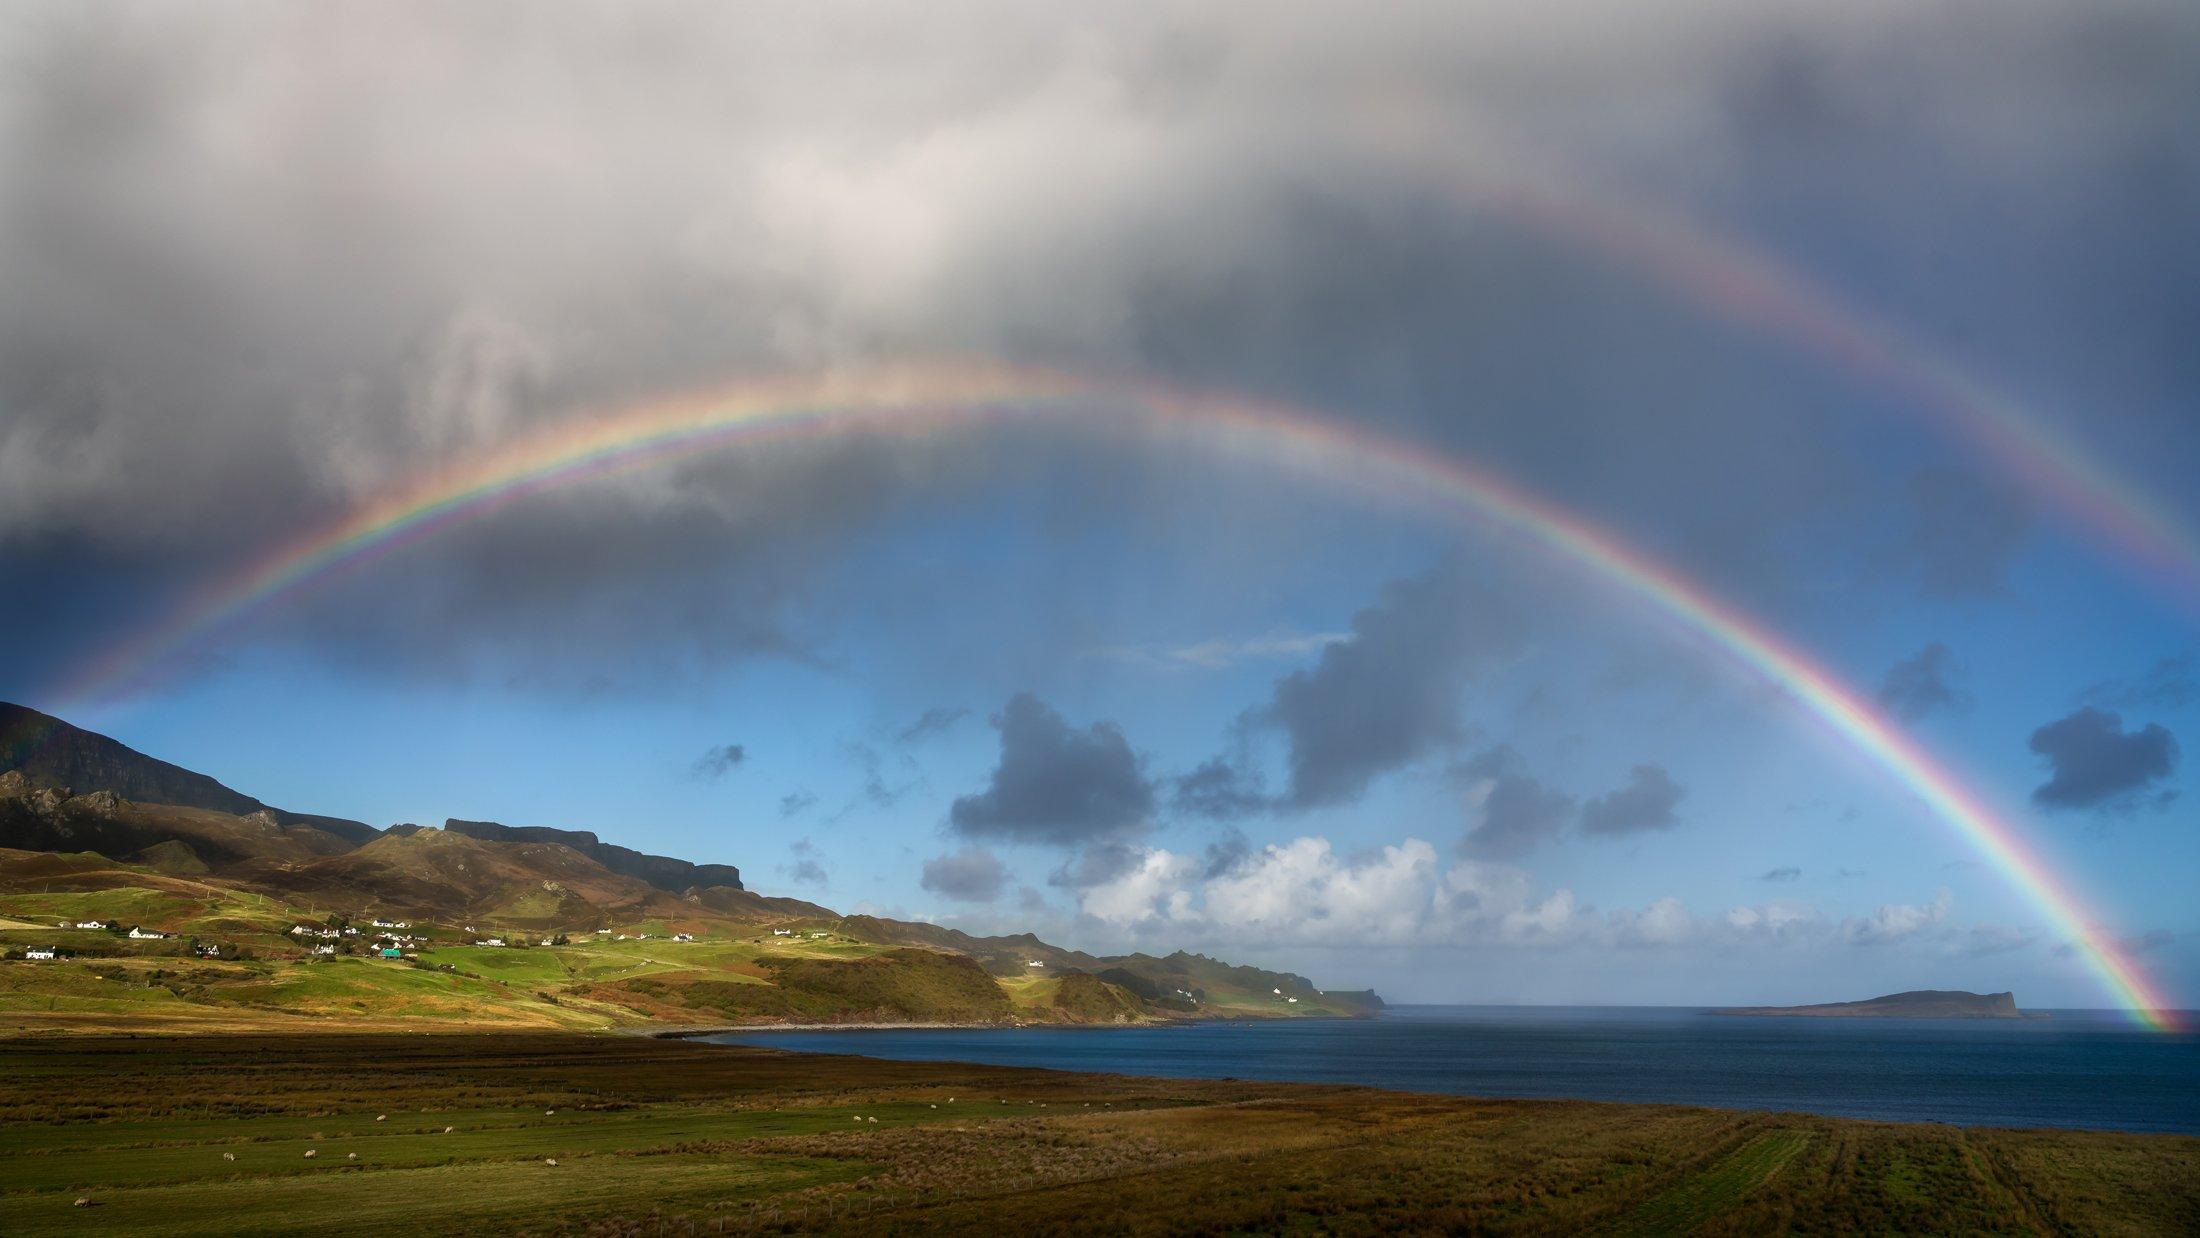 A double rainbow arcs above the Isle of Skye, one of many seen during the photo tour. (Glenn Davis/glenndavisphotography.com)